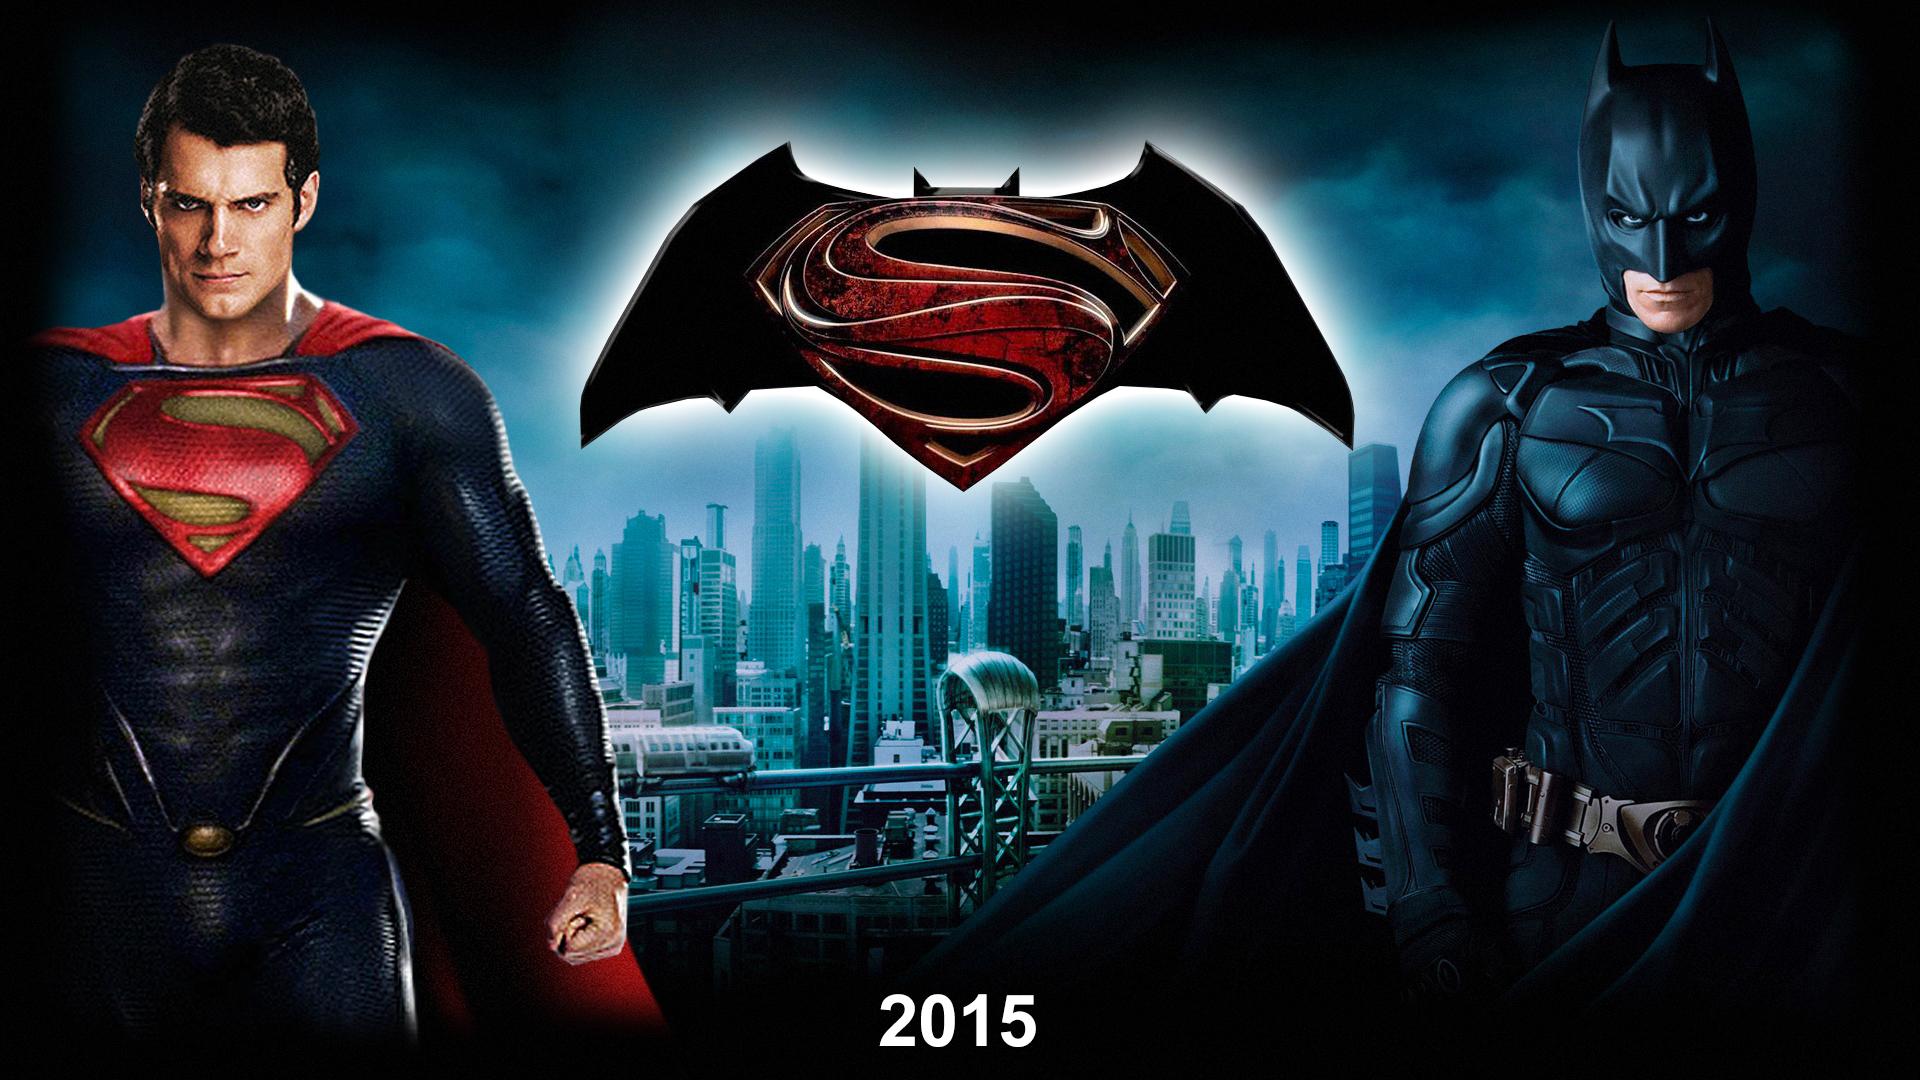 superman vs batman wallpaper by loganchico fan art wallpaper movies tv 1920x1080